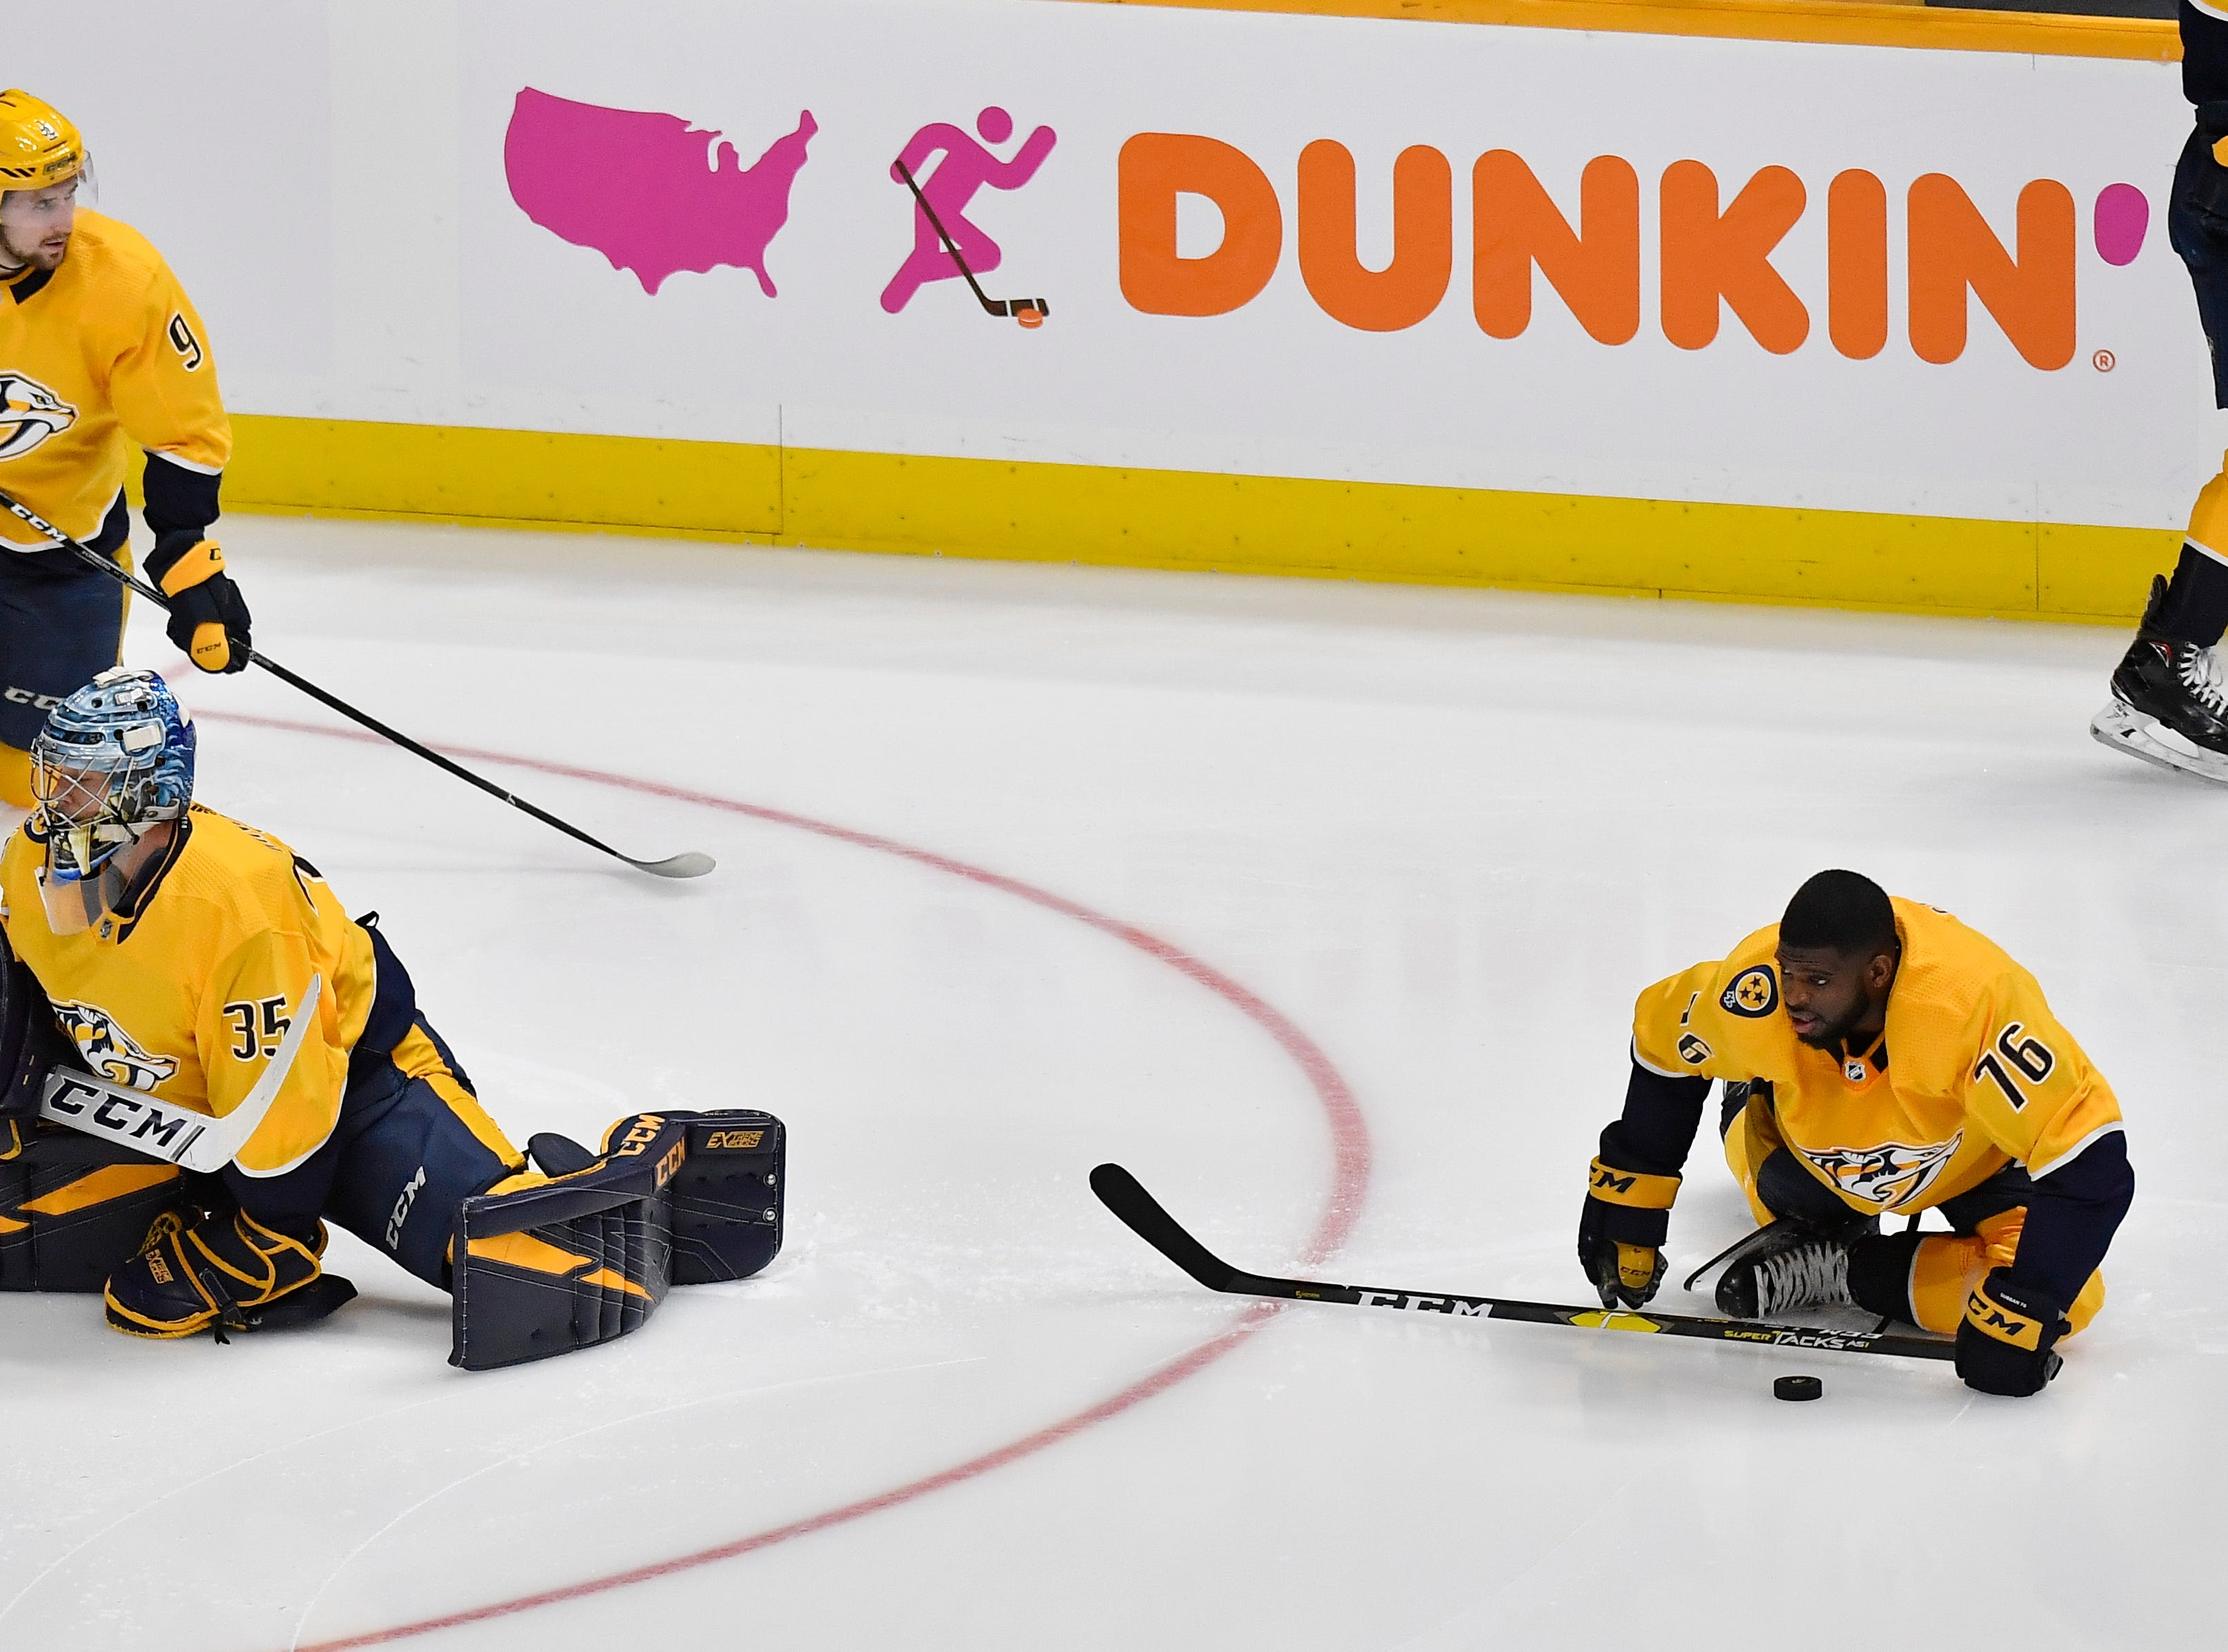 Nashville Predators goaltender Pekka Rinne (35) and defenseman P.K. Subban (76) warm up before the divisional semifinal game against the Dallas Stars at Bridgestone Arena in Nashville, Tenn., Wednesday, April 10, 2019.